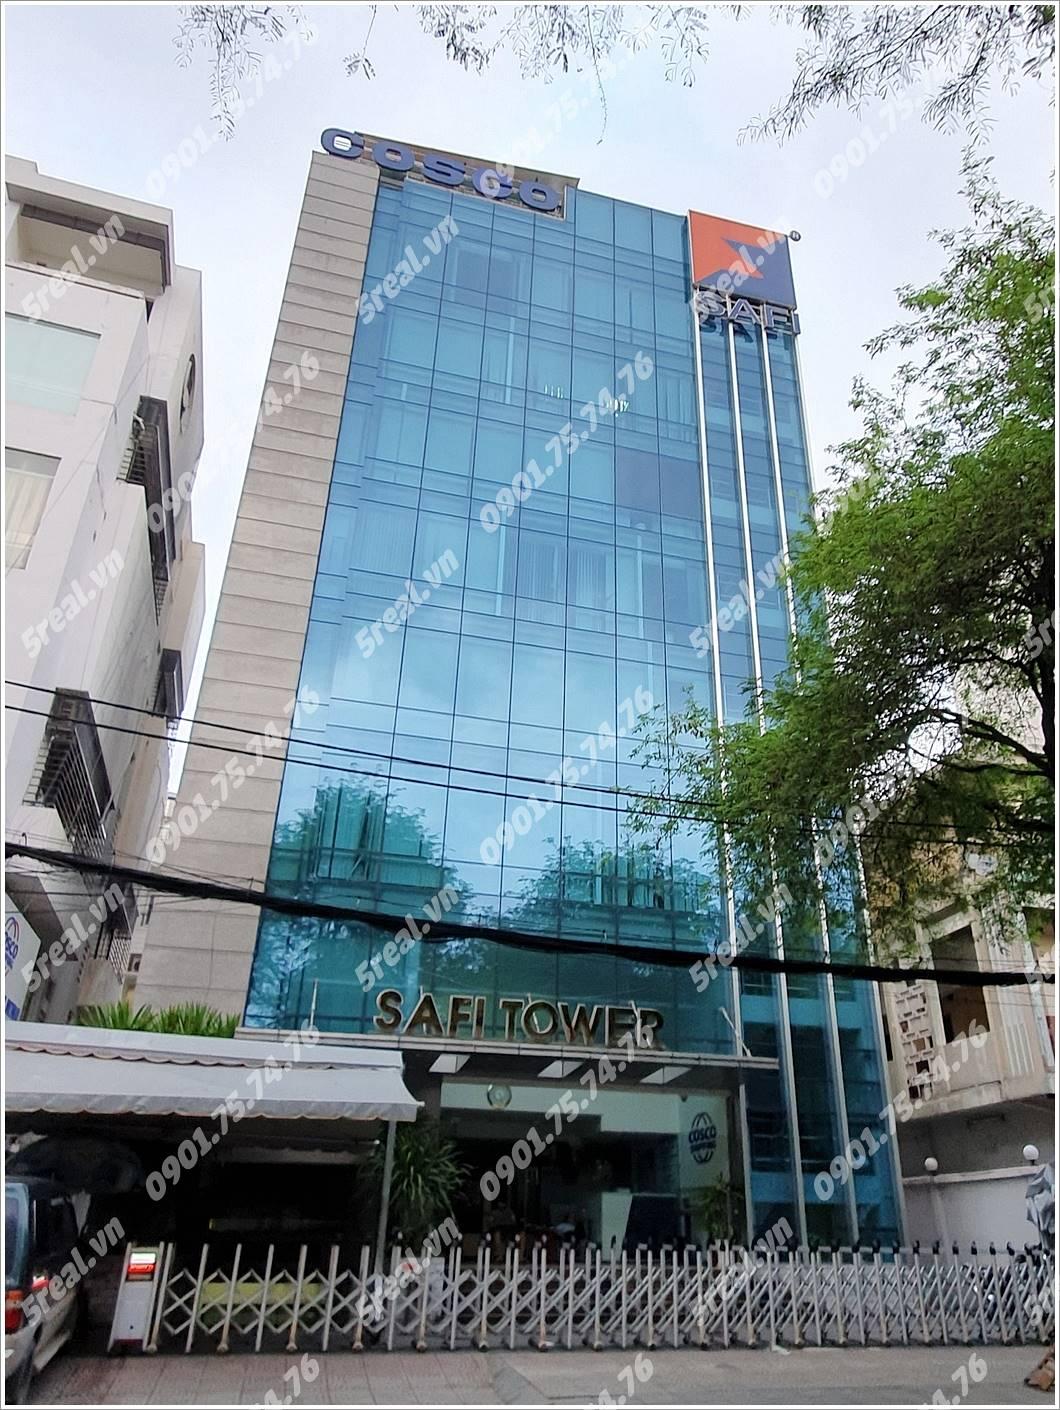 safi-tower-nguyen-van-thu-quan-1-van-phong-cho-thue-5real.vn-01